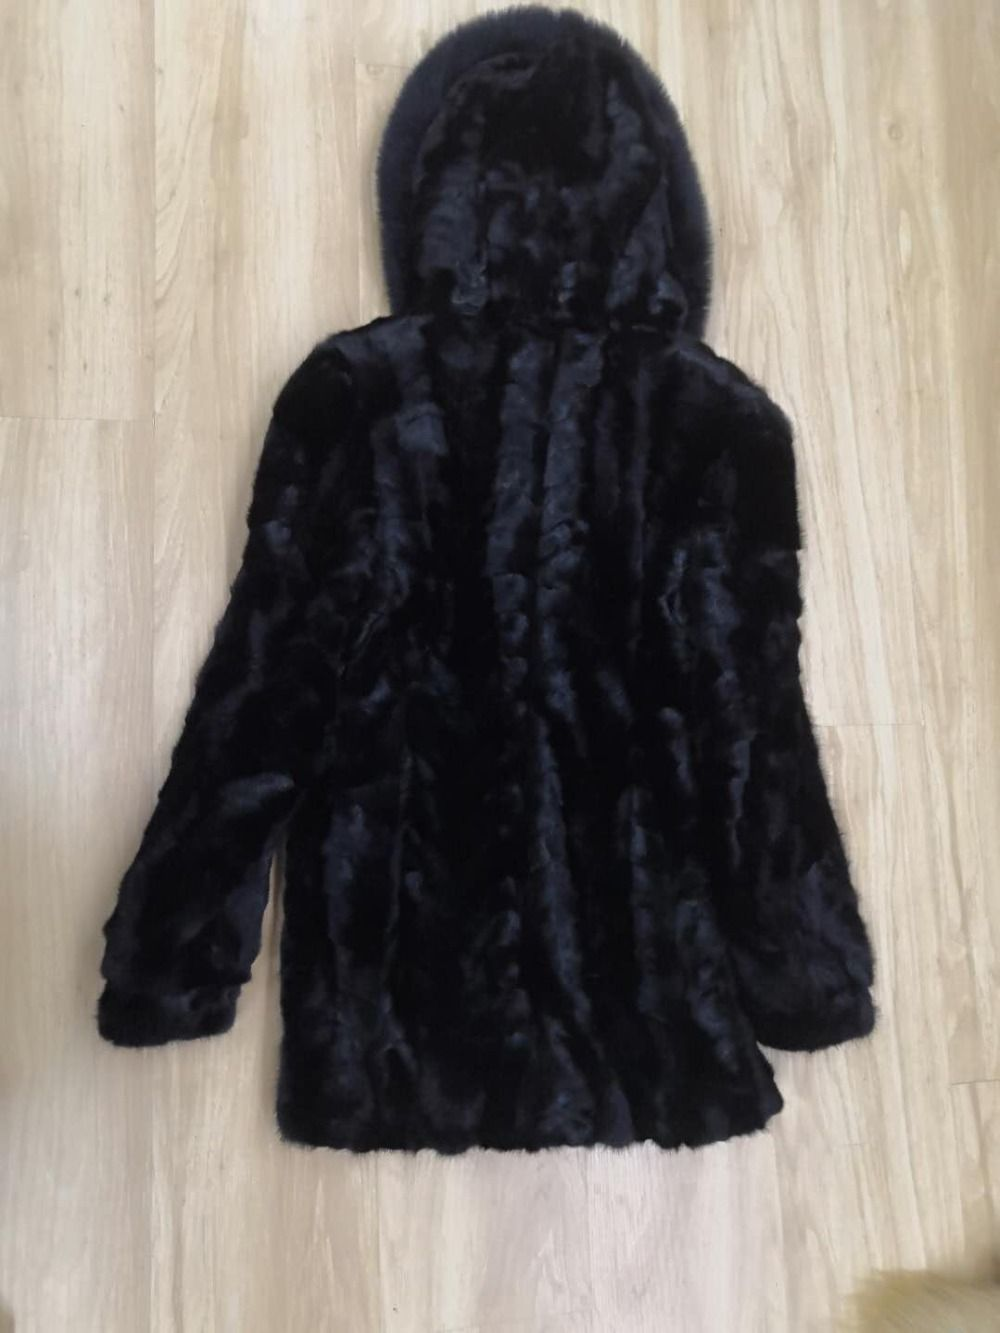 2018 real mink coats women winter jacket